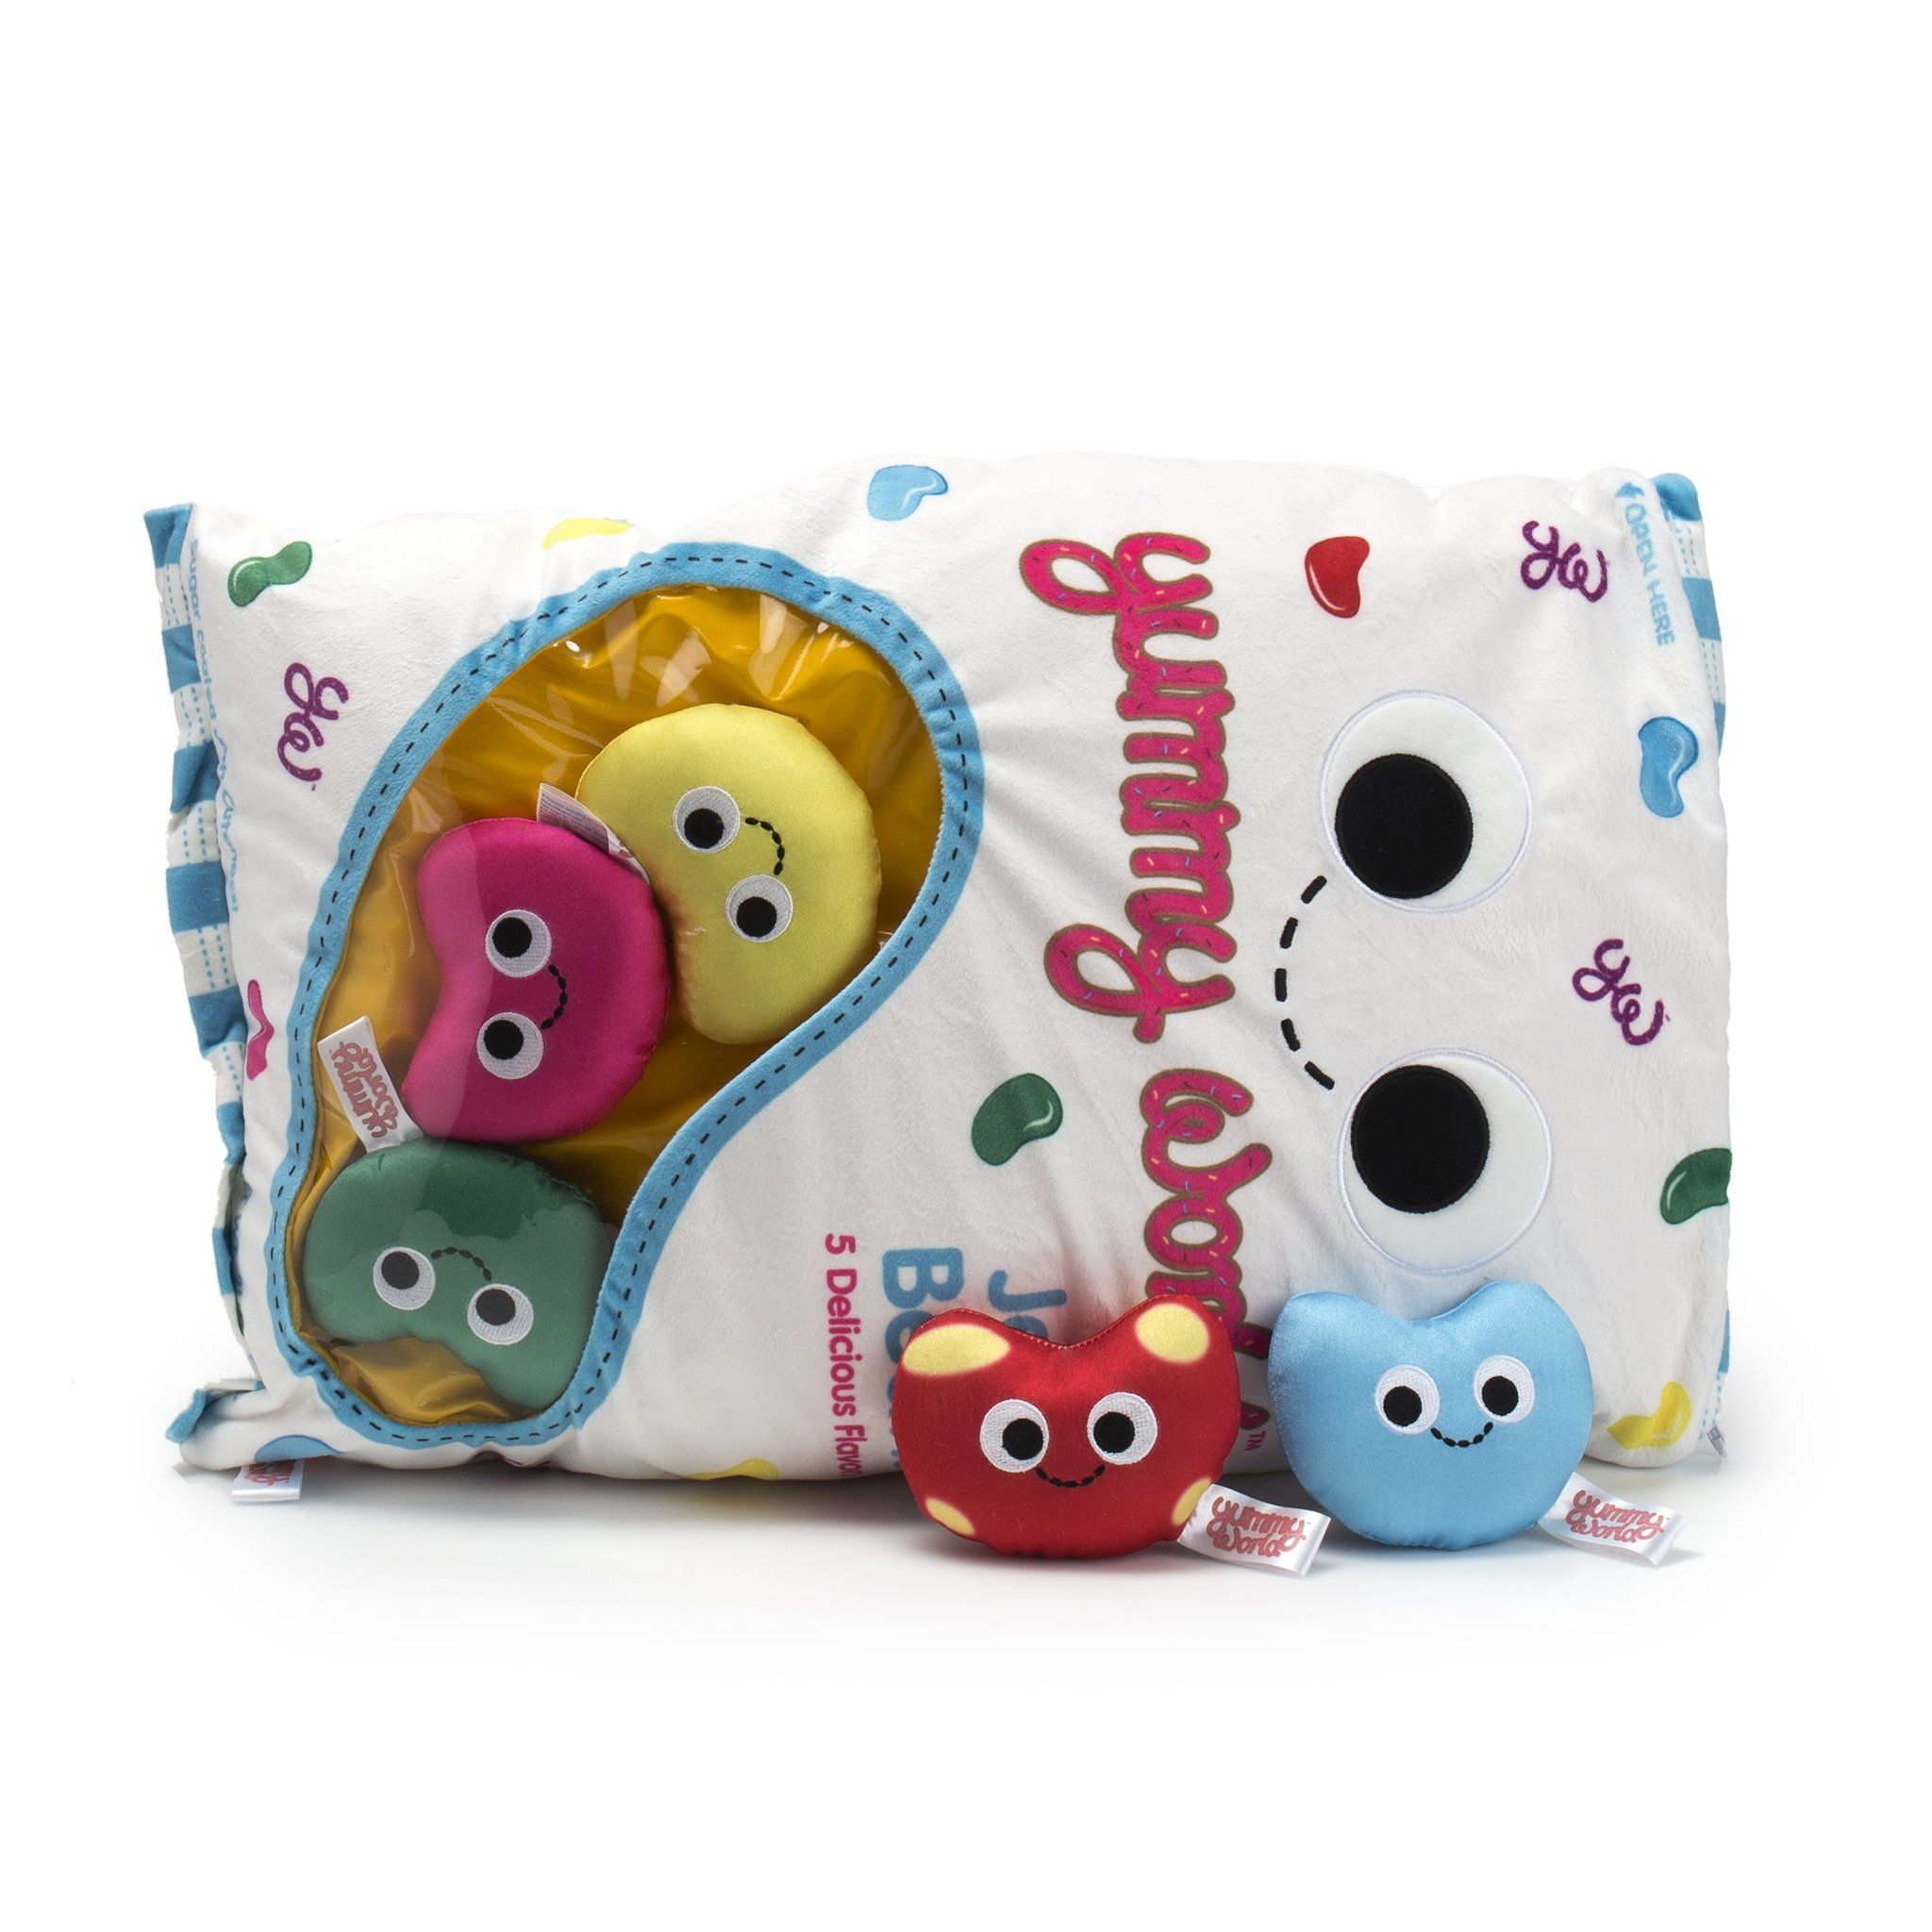 Yummy World Jeni and the Jelly Beans XL Interactiv